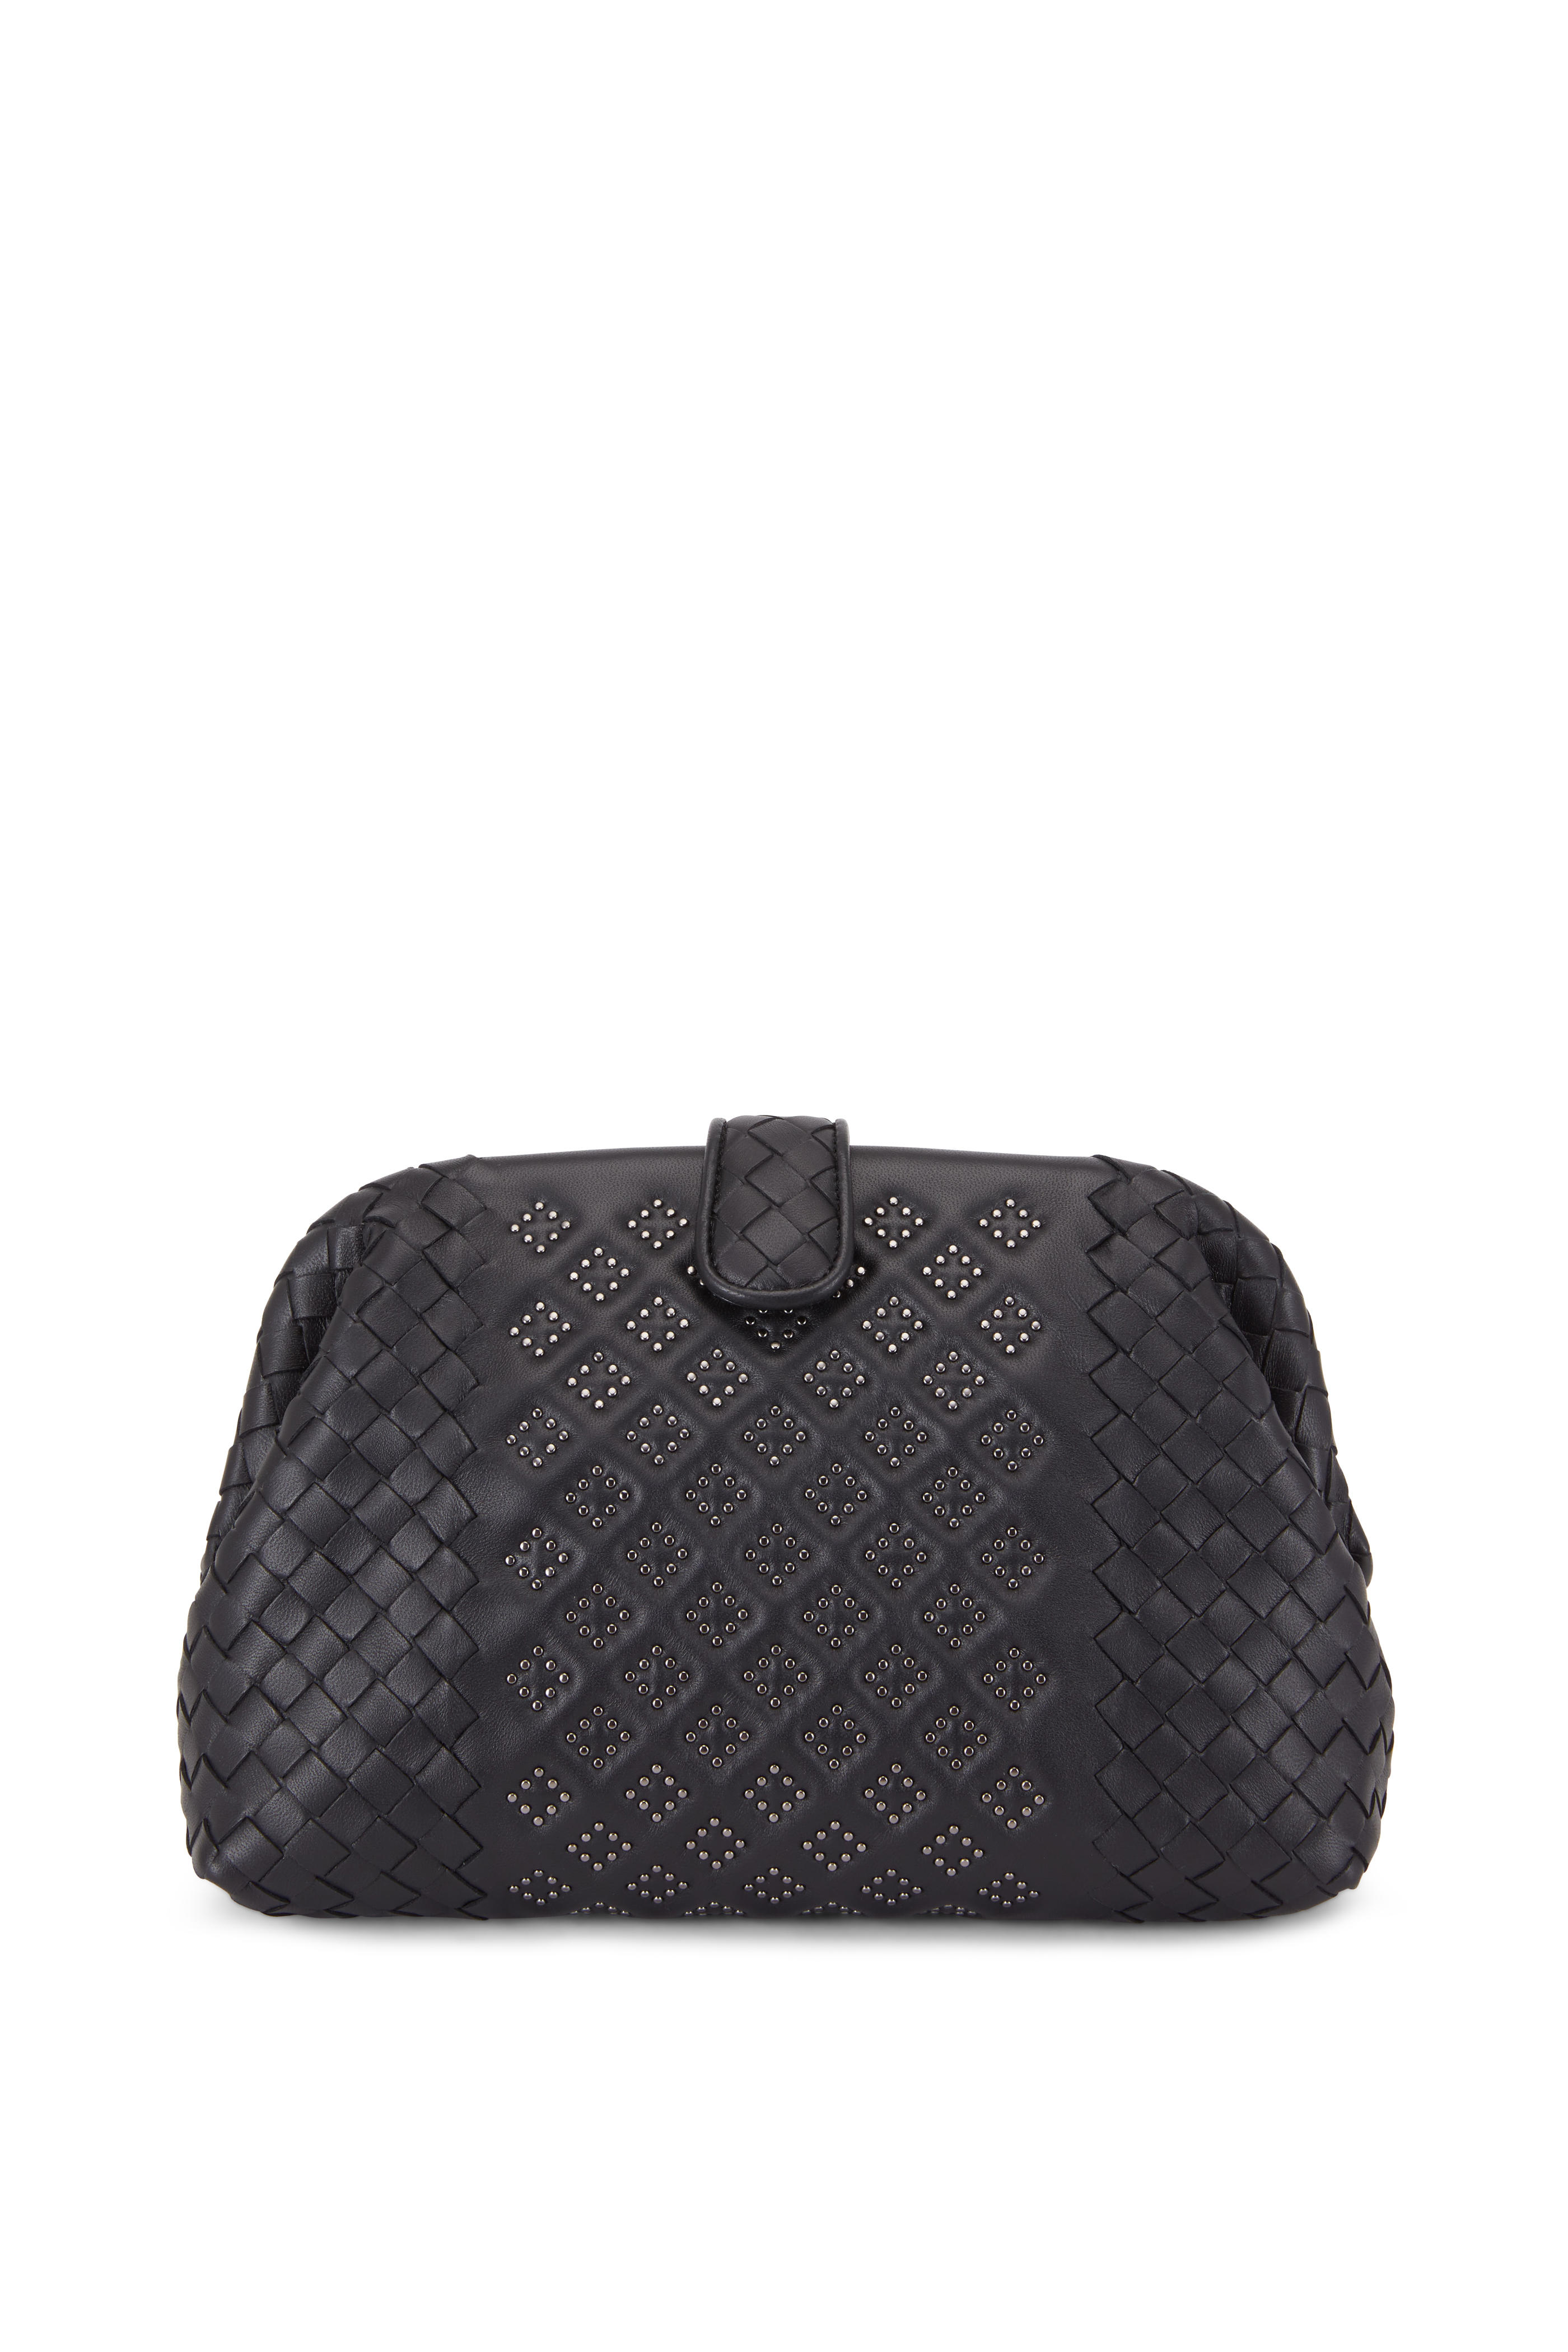 Bottega Veneta - Black Intrecciato Micro Studded Medium Clutch ... 03c8b12d77a9a